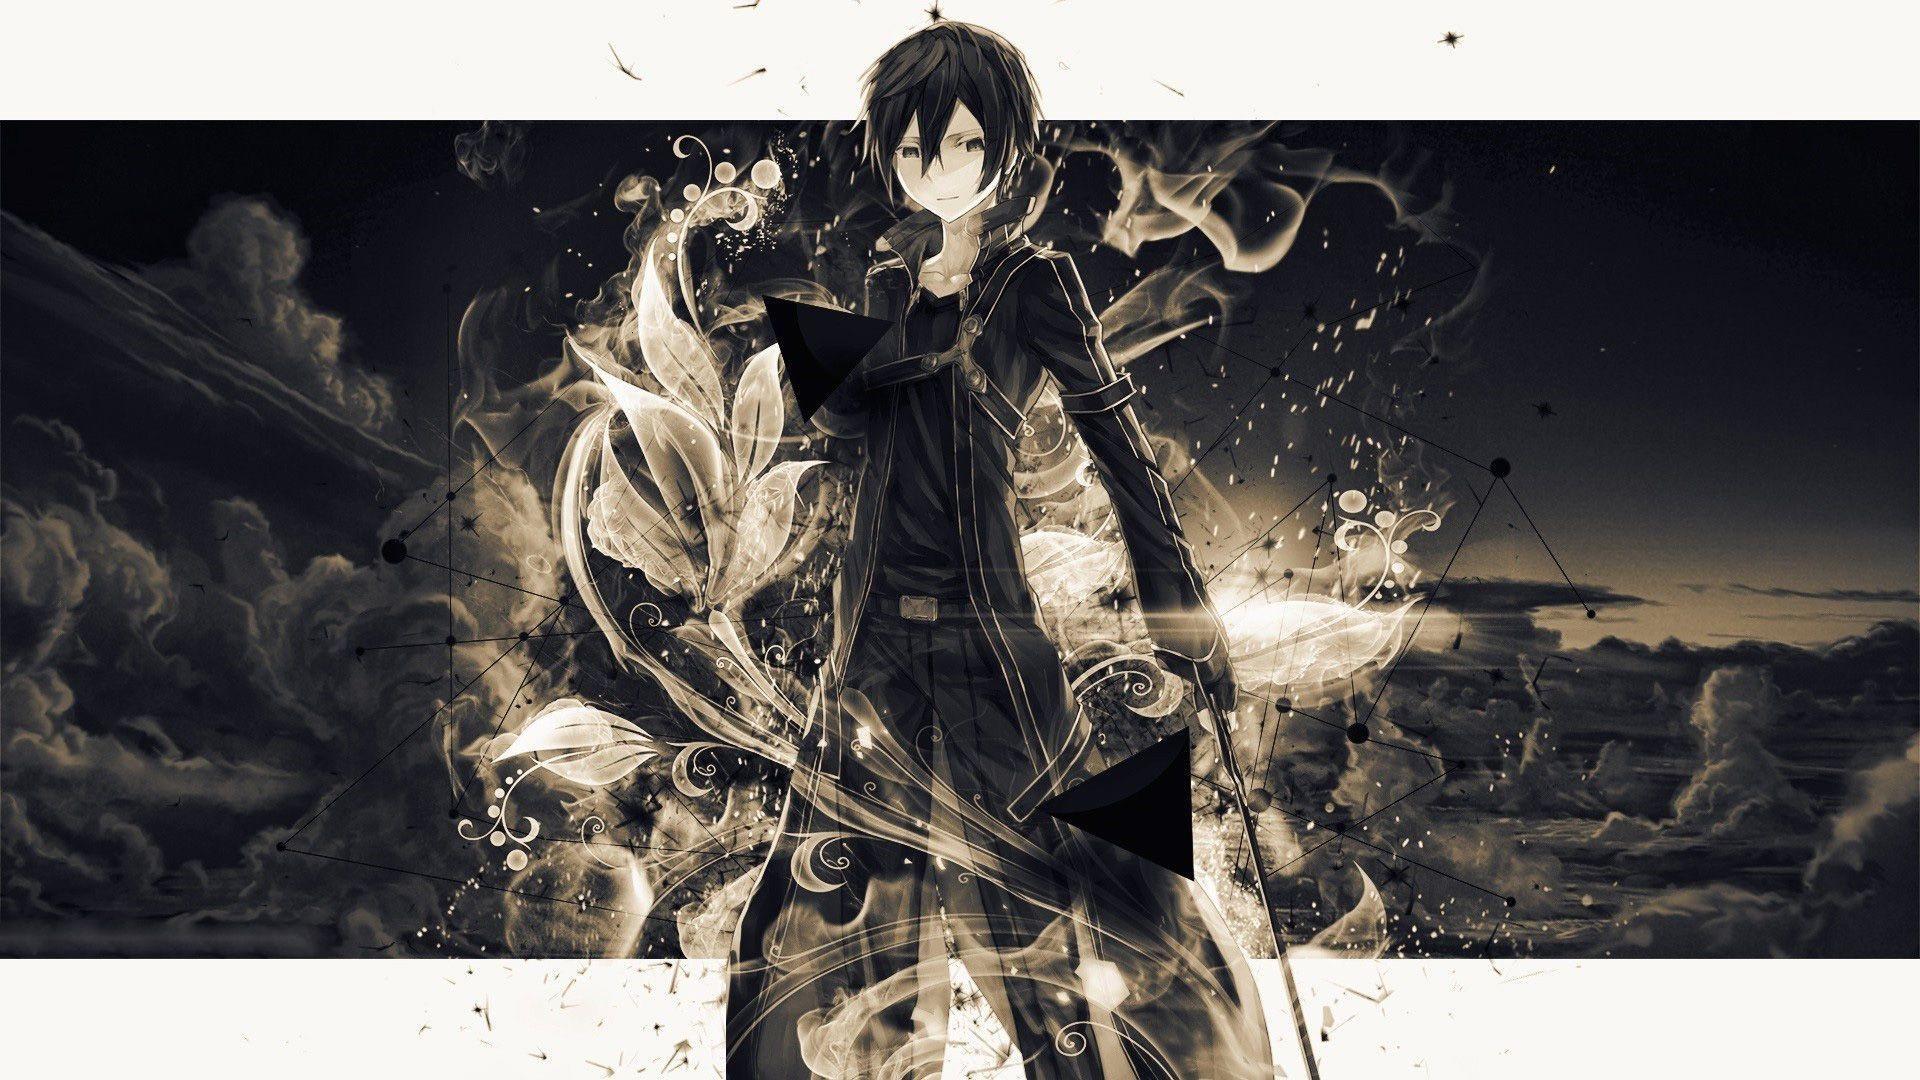 Badass Anime Wallpaper 1920x1080 63 Images